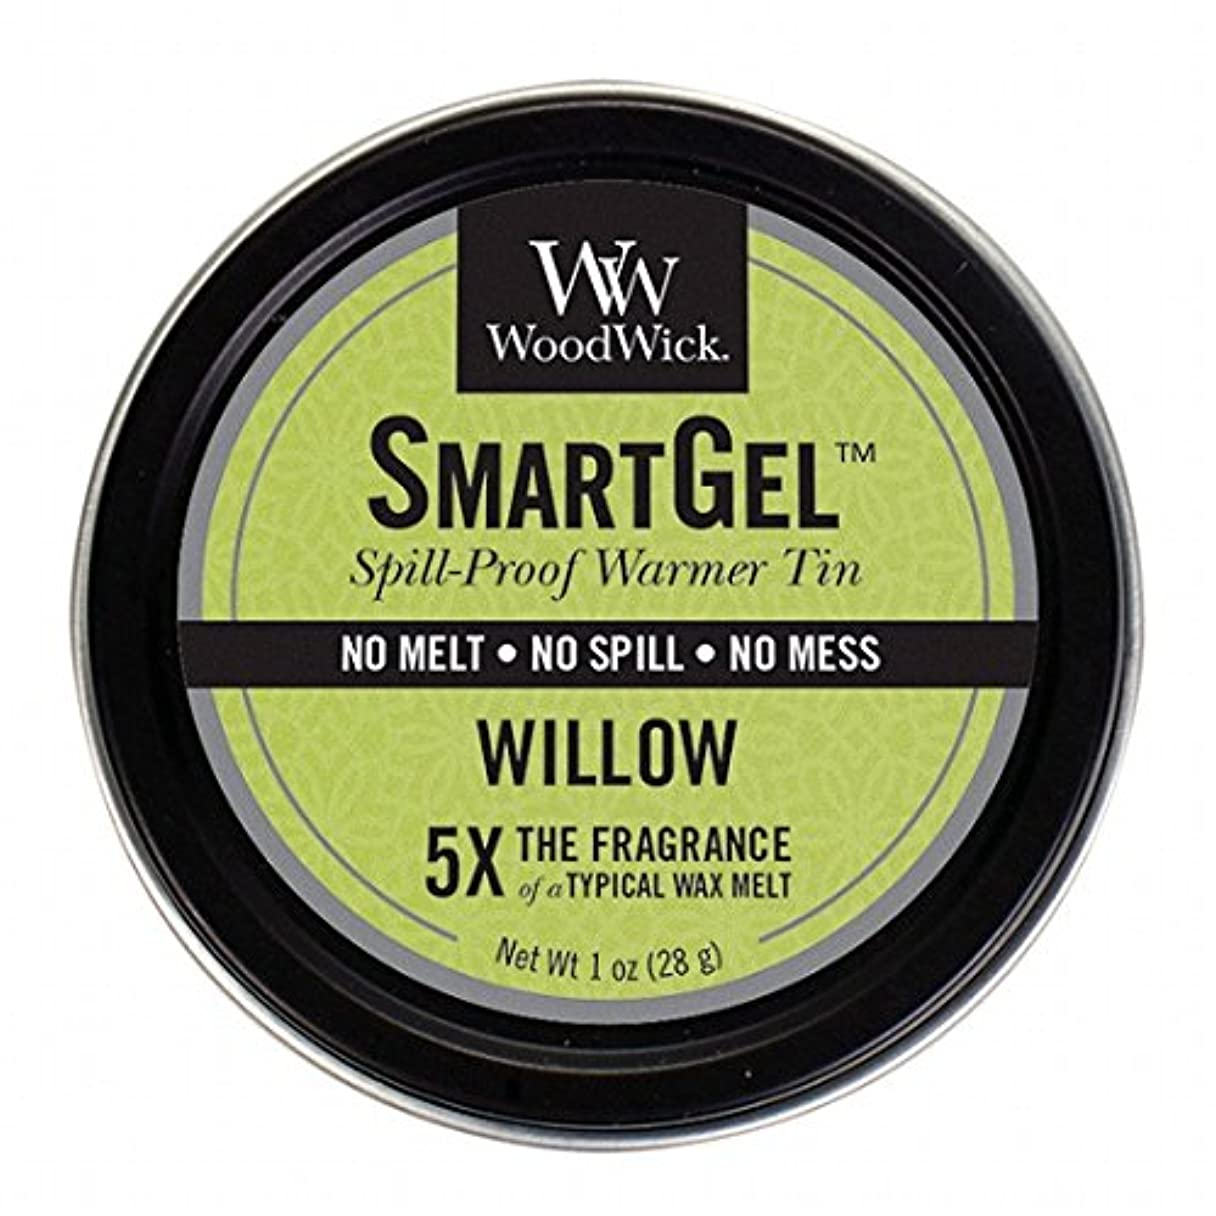 WoodWick(ウッドウィック) Wood Wickスマートジェル 「 ウィロー 」W9630525(W9630525)